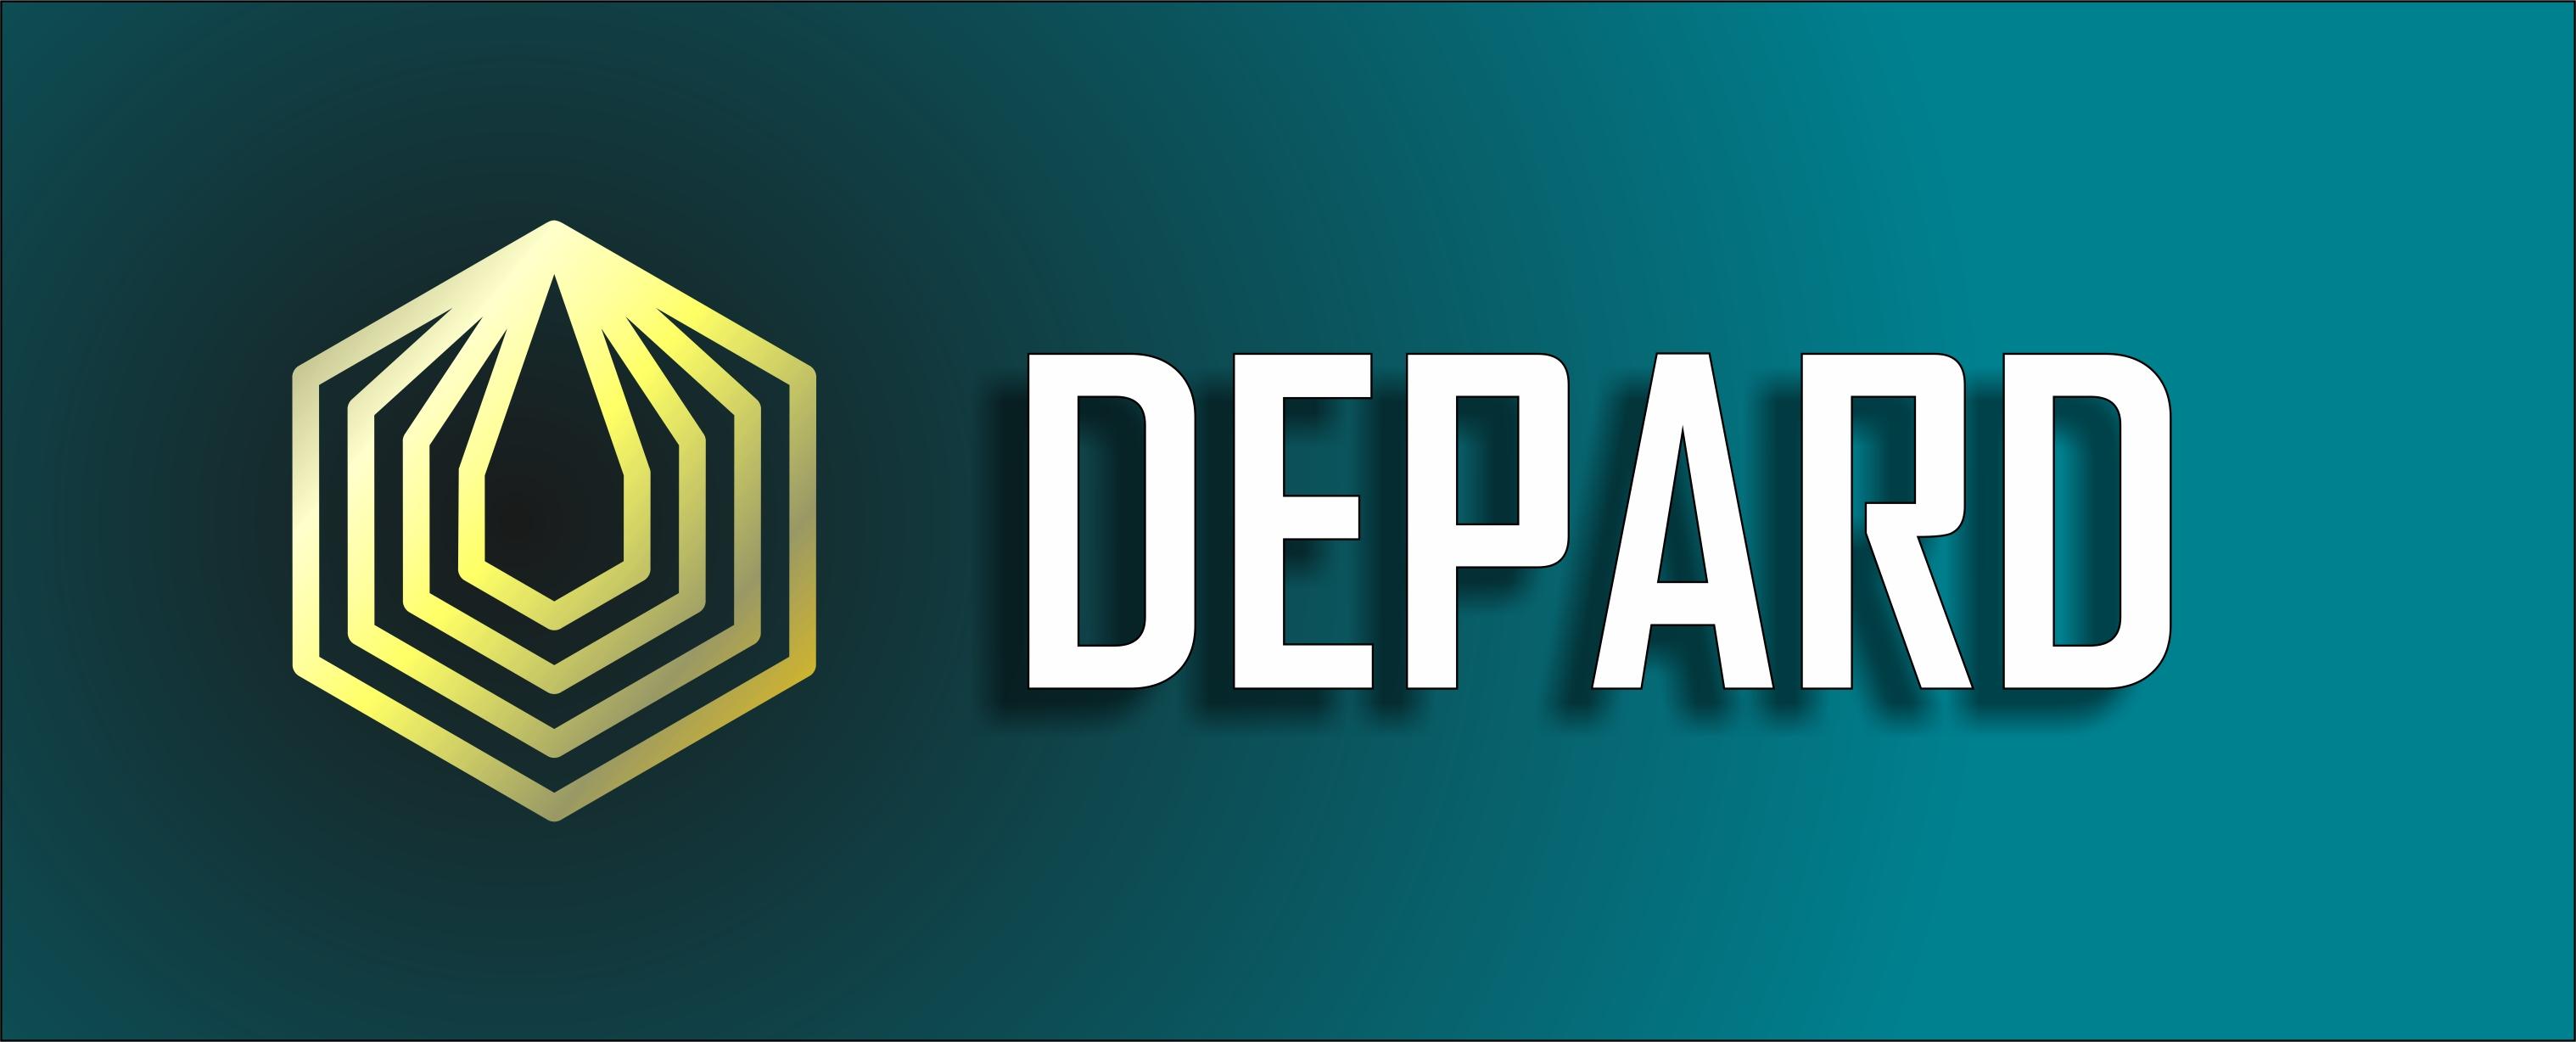 Логотип для компании (услуги недвижимость) фото f_9025935368fe2a9c.jpg